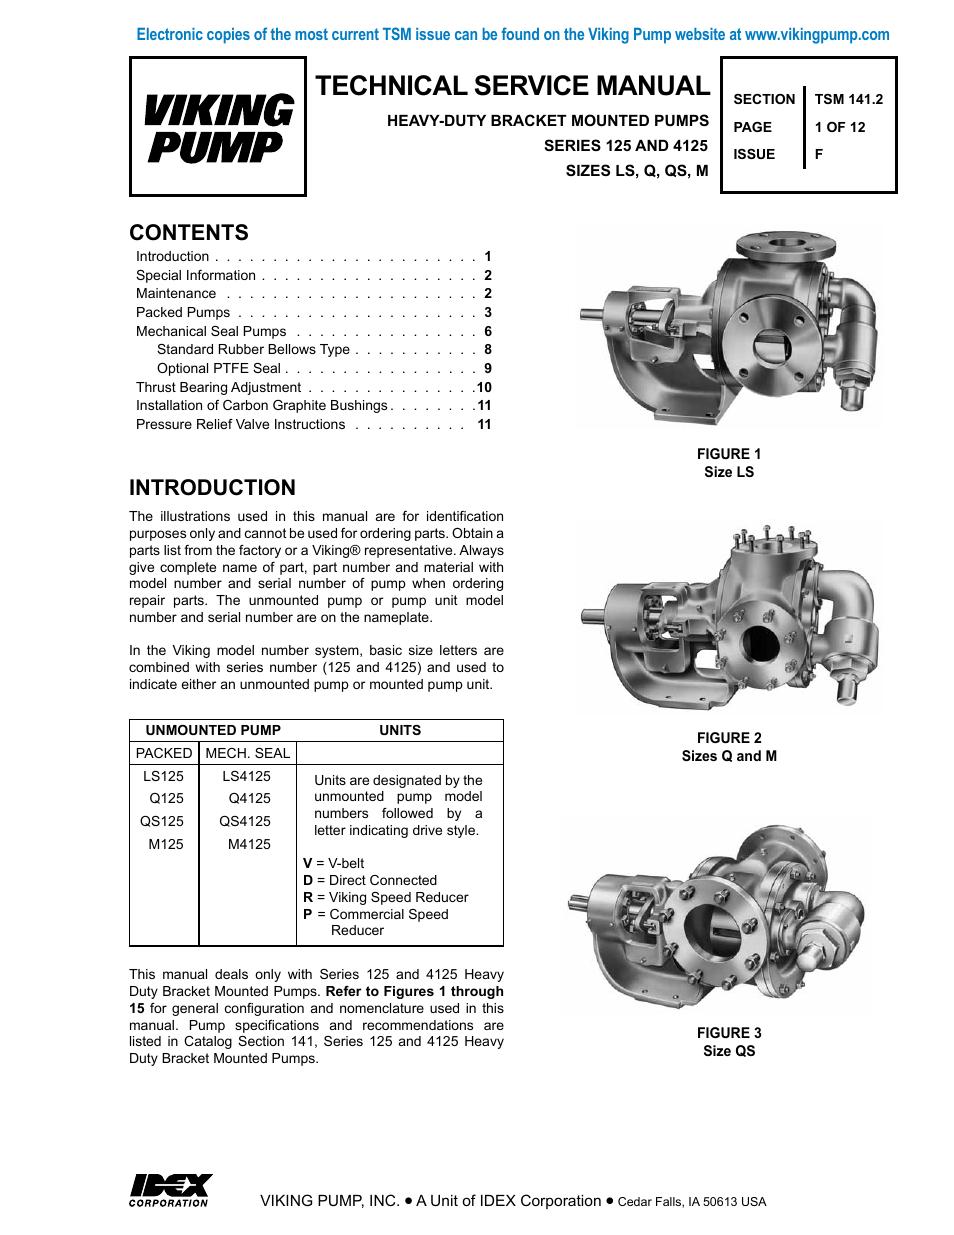 Viking Pump Diagram Wiring Schematic Data Diagrams Blog Kk4124a